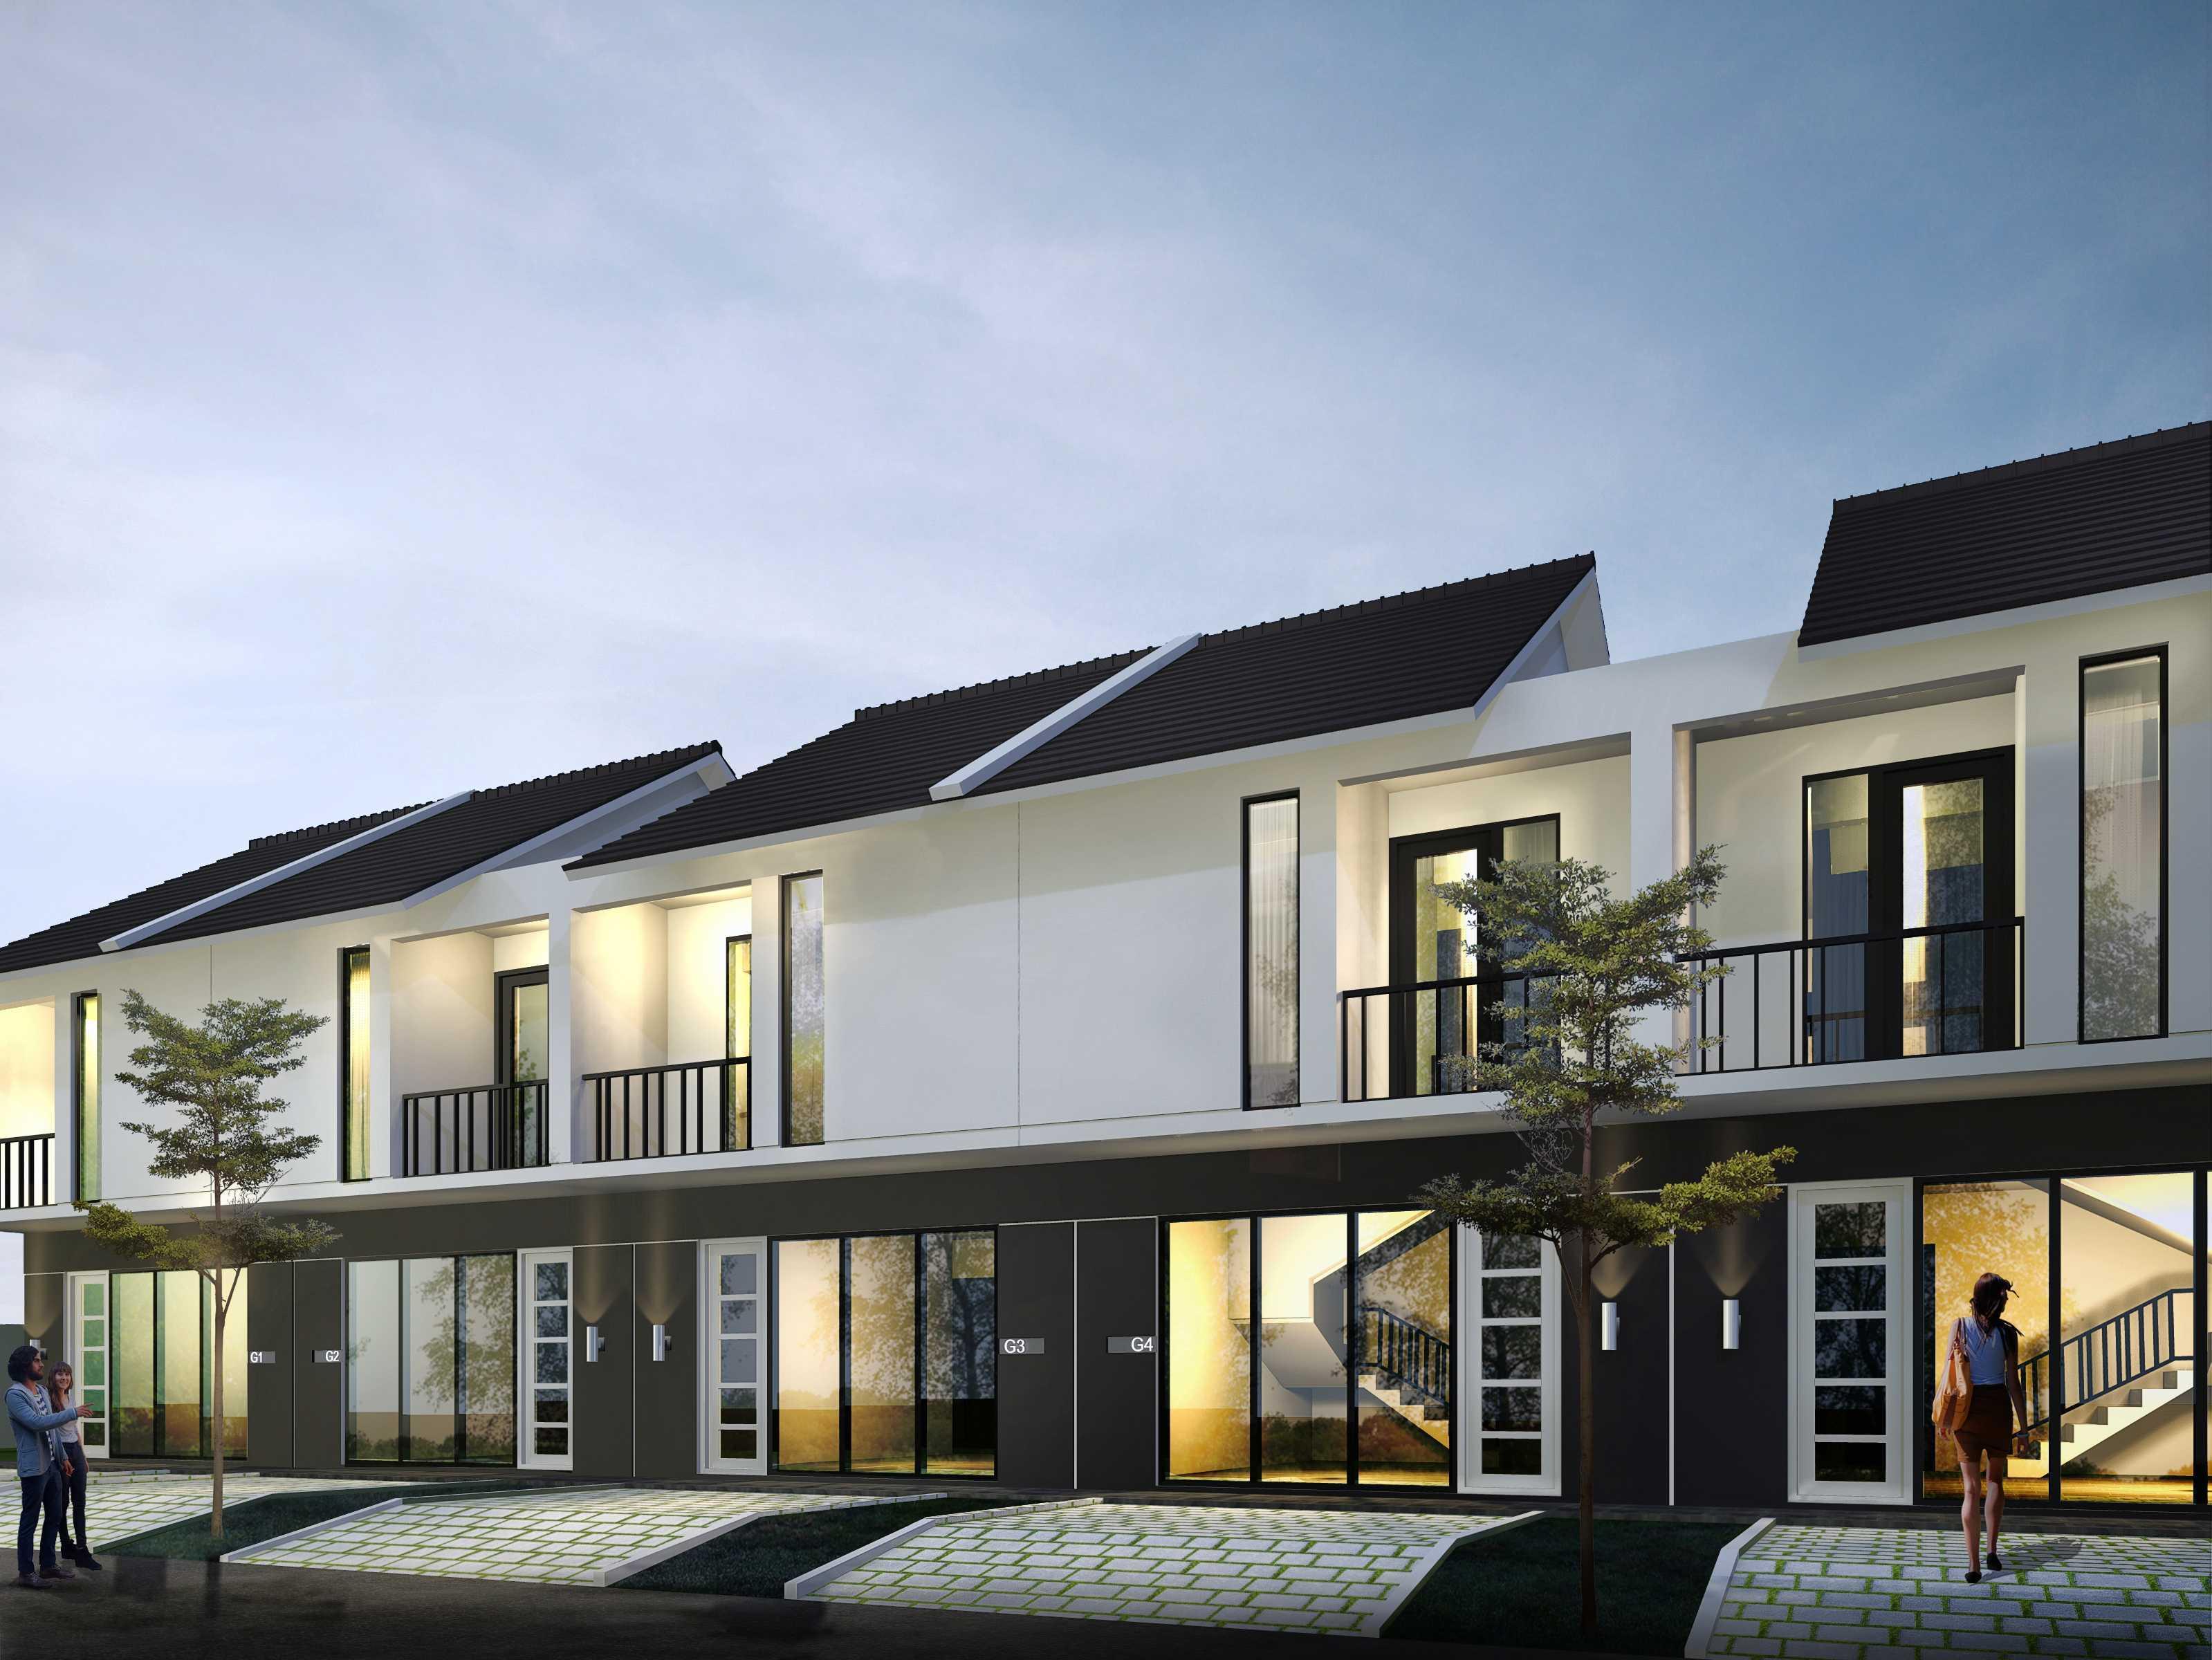 Atelier Baou+ Gv House  Depok, Kota Depok, Jawa Barat, Indonesia Depok, Kota Depok, Jawa Barat, Indonesia Exterior View   52439